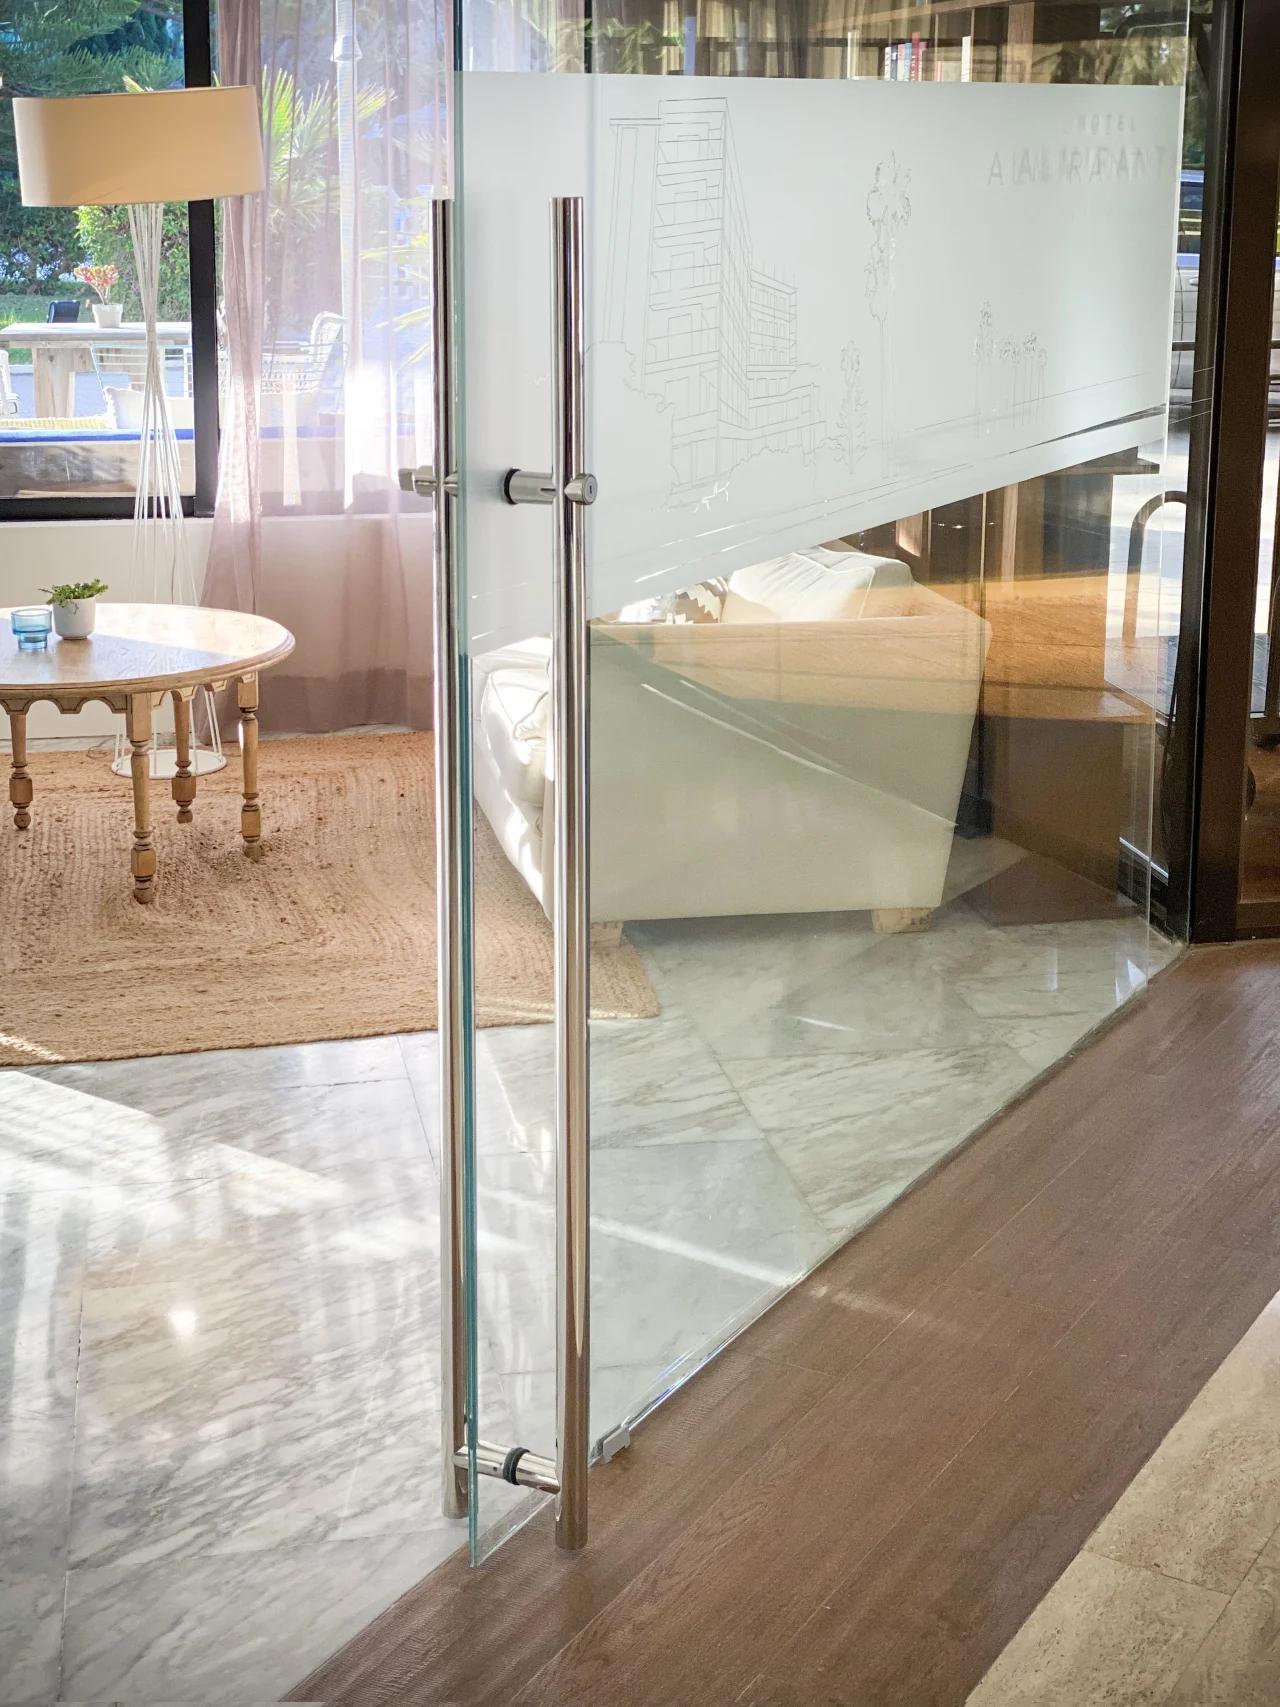 Tirador puerta acero inoxidable para puerta casa de cristal